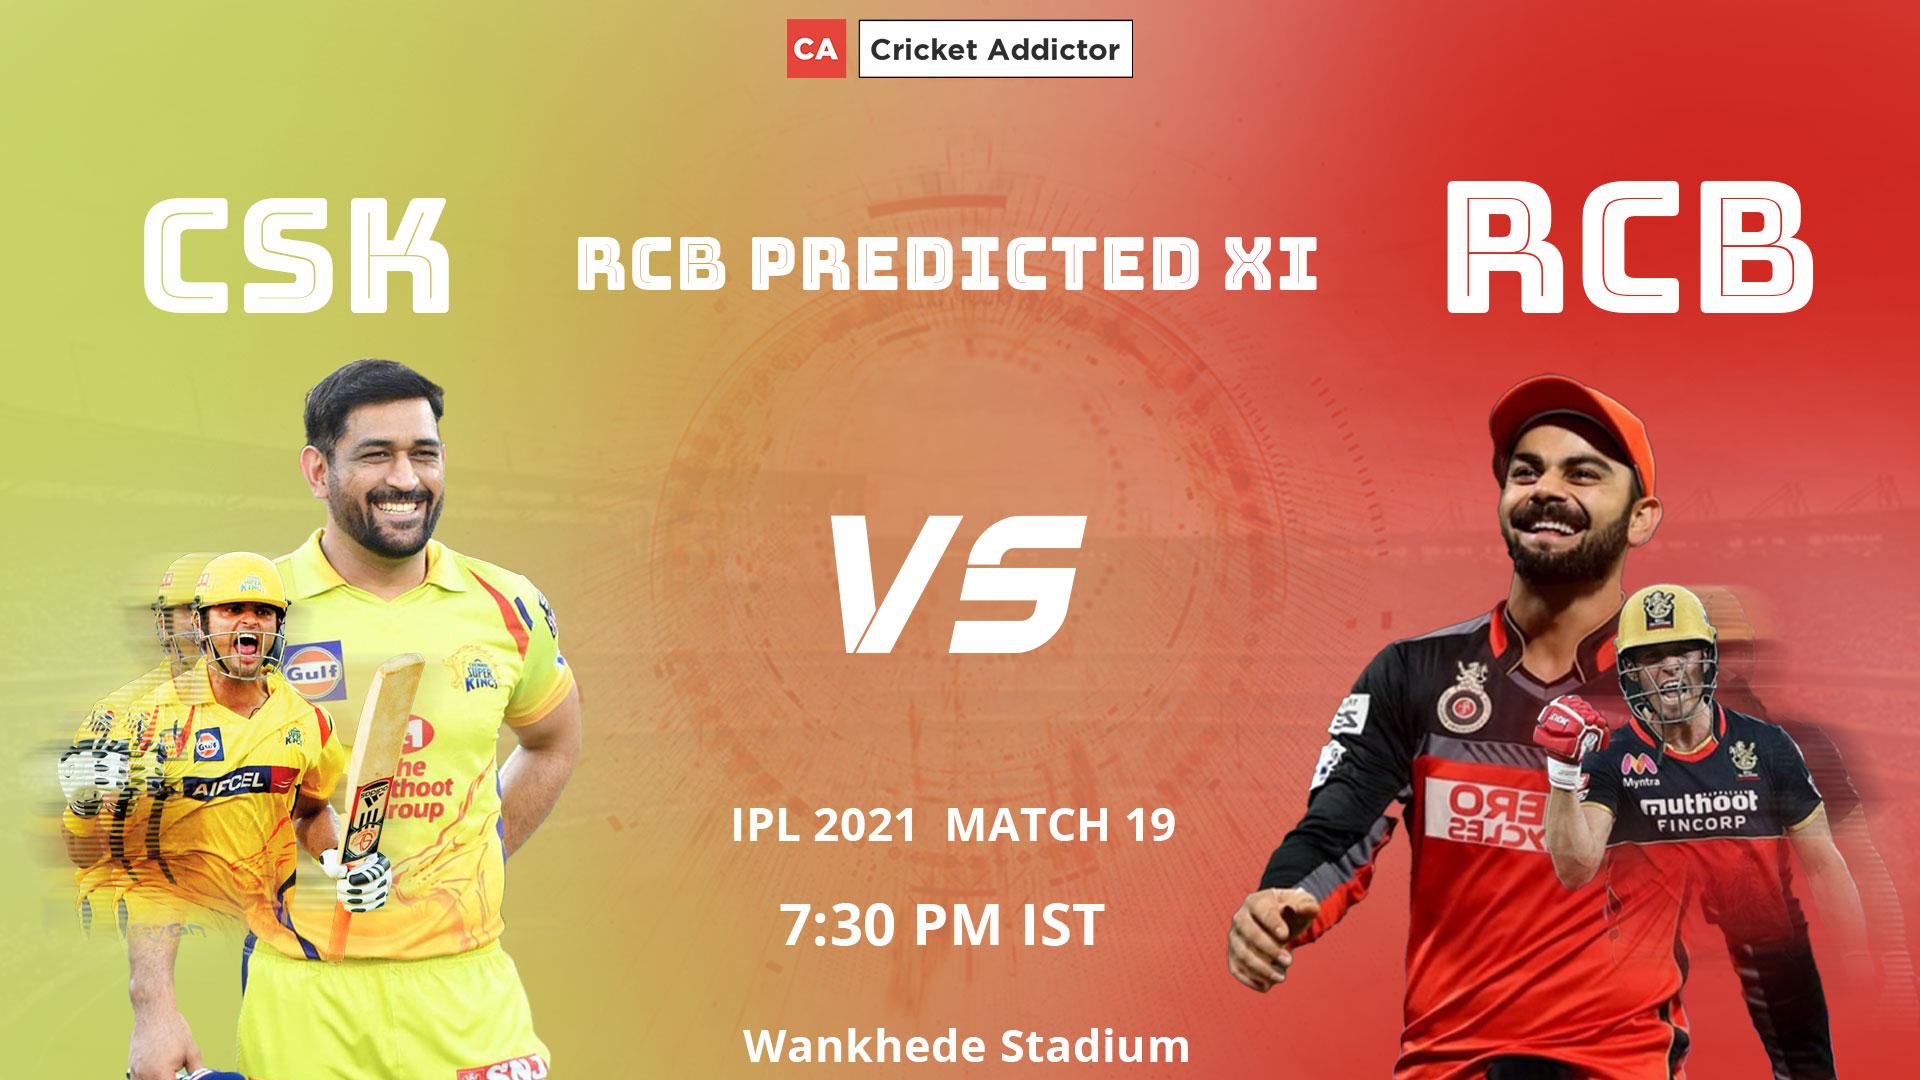 IPL 2021, CIPL 2021, Royal Challengers Bangalore, RCB, CSK vs RCB, predicted playing XI, playing XI